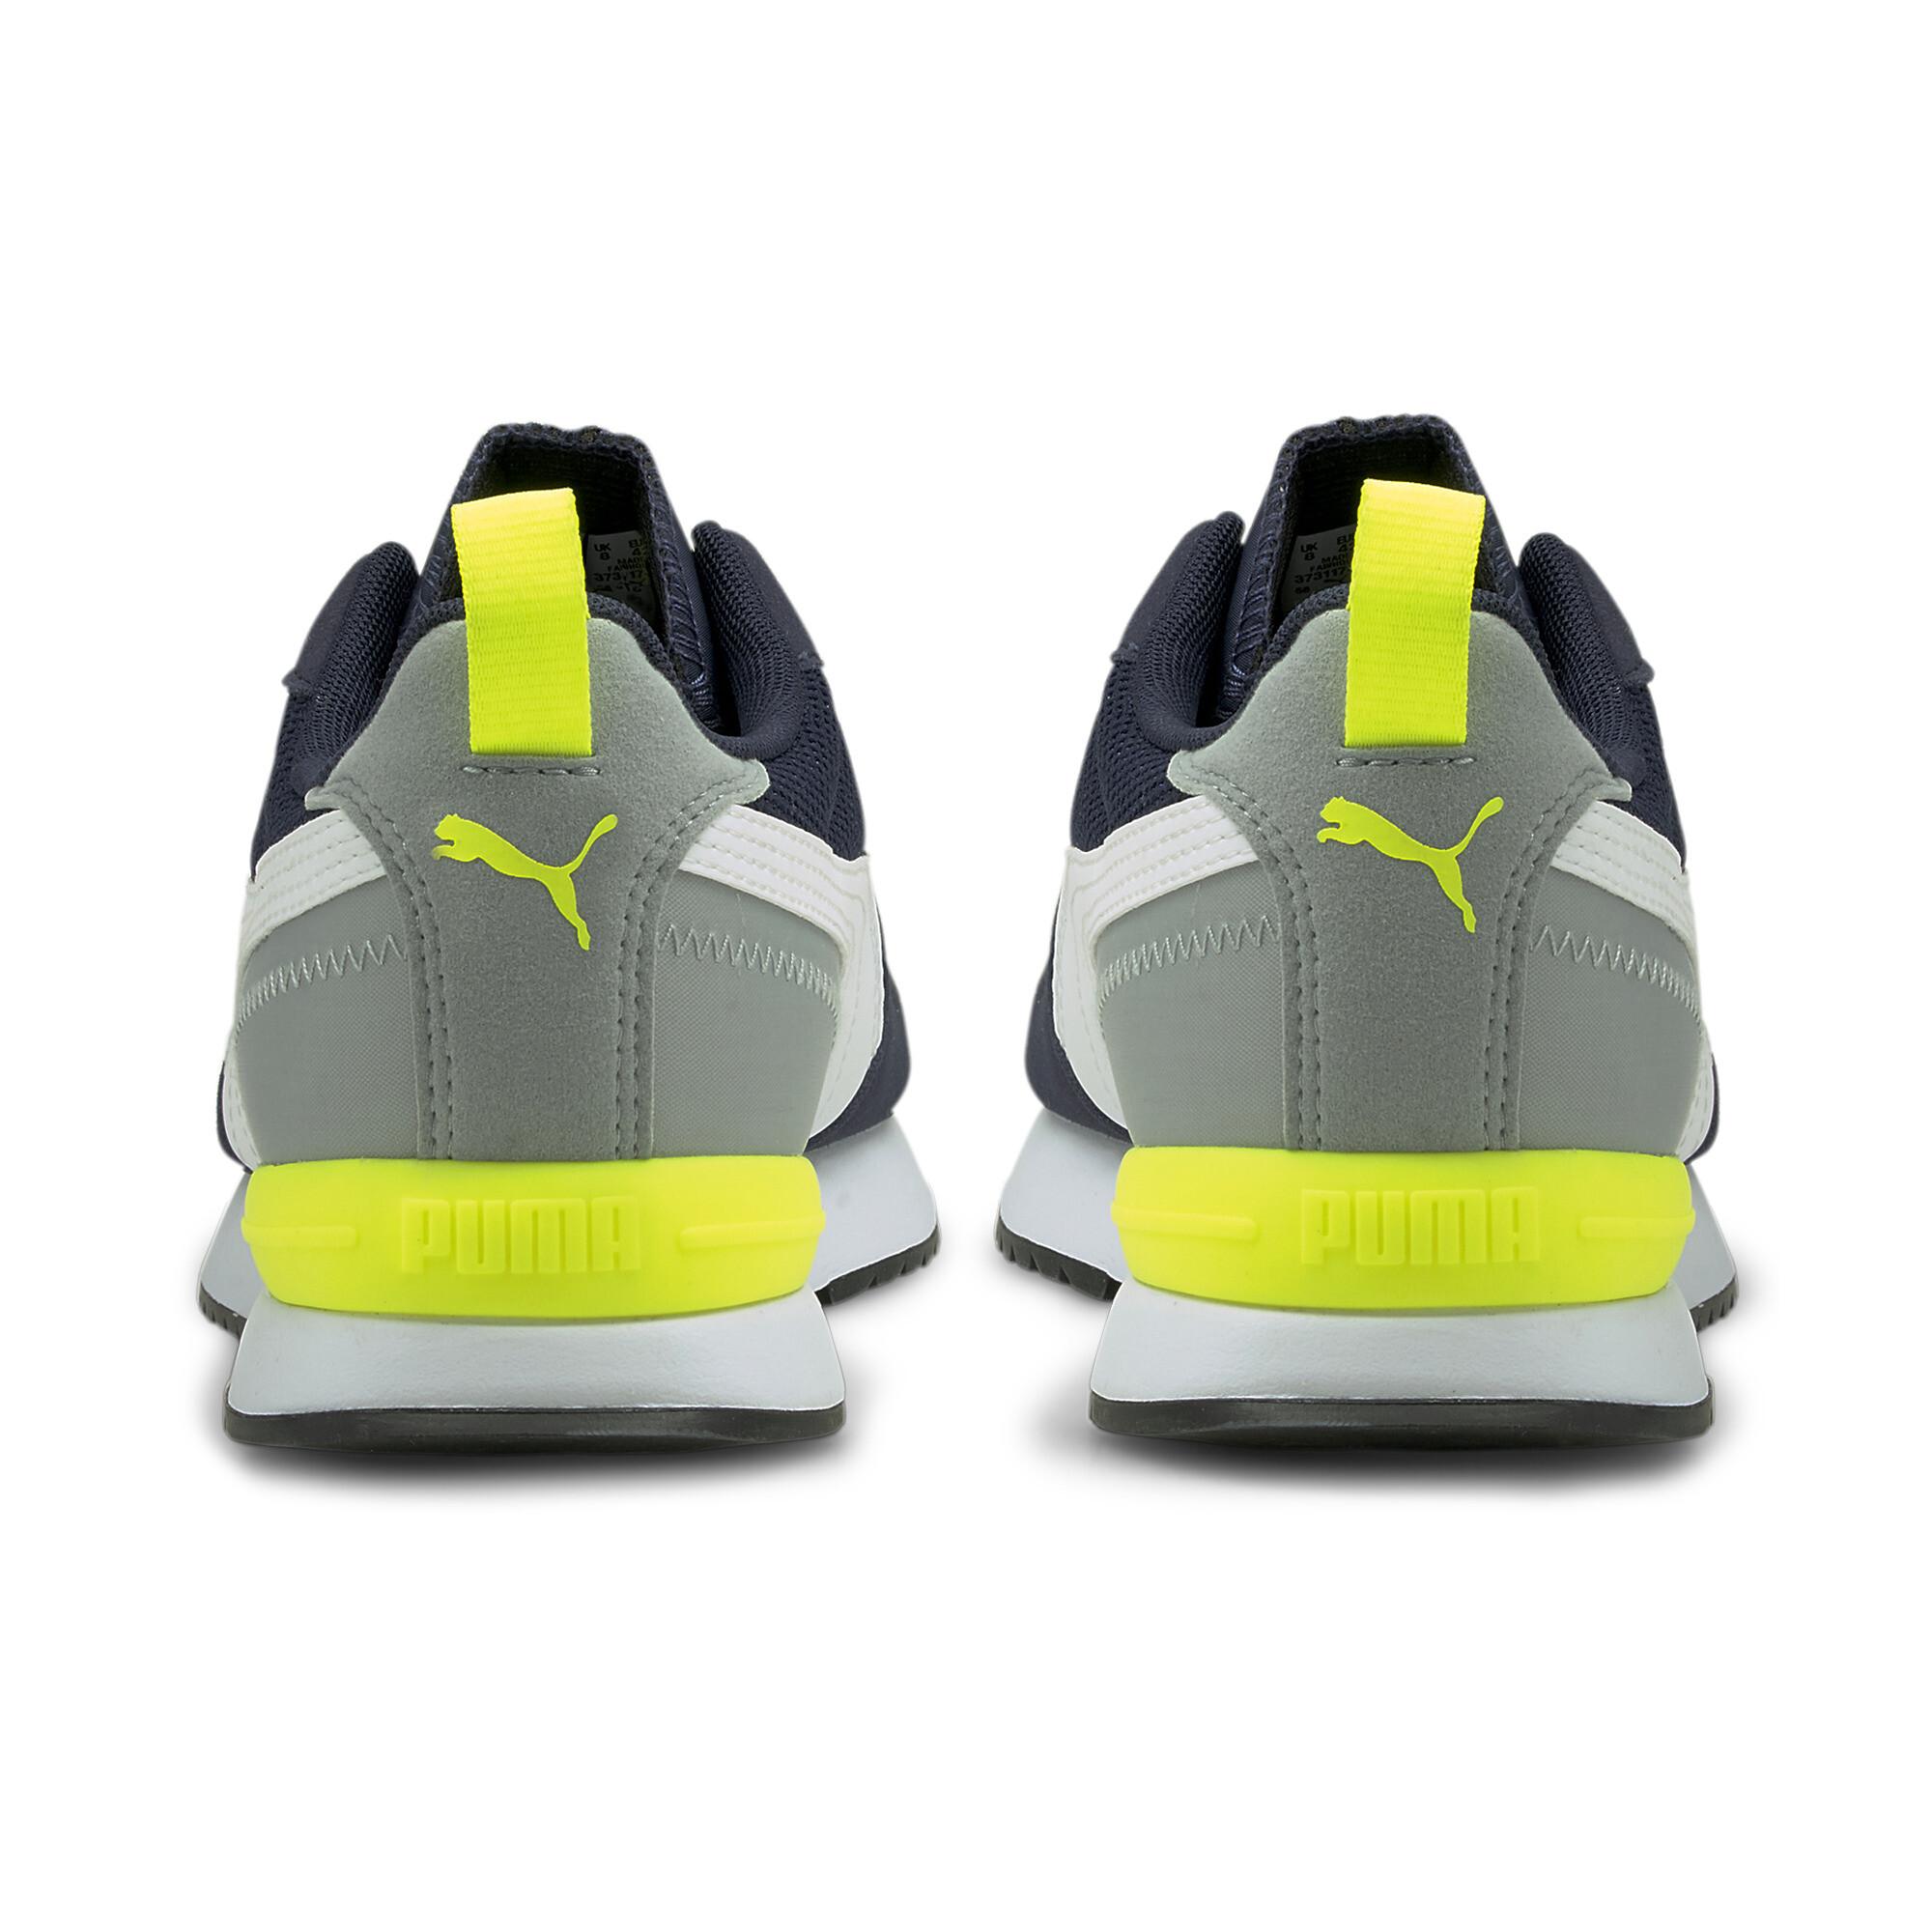 thumbnail 18 - PUMA-Men-039-s-R78-Sneakers